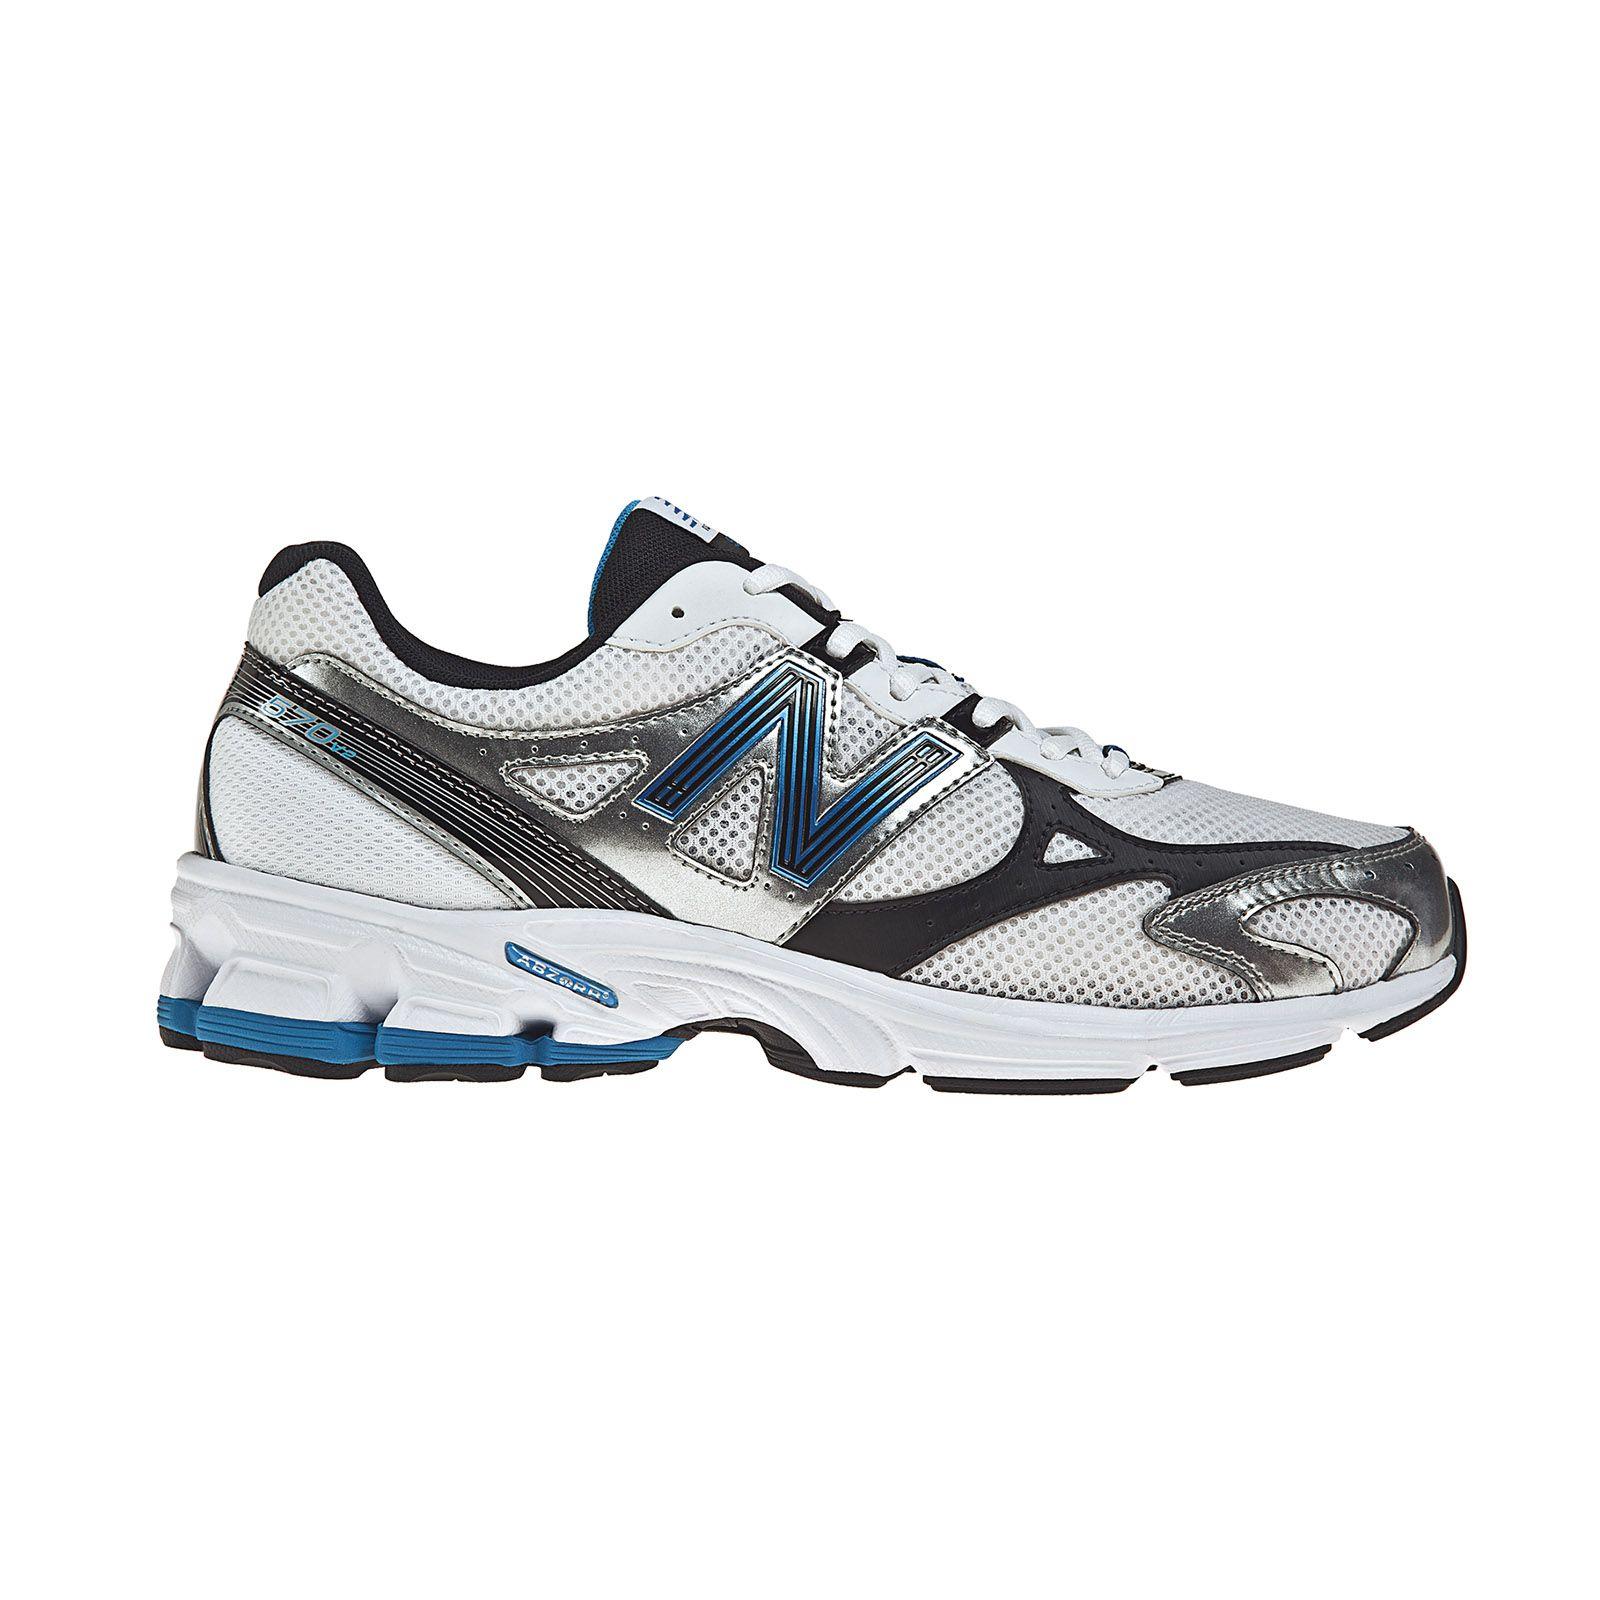 new_balance_m570wb2_mens_running_shoes_new_balance_m570wb2_mens